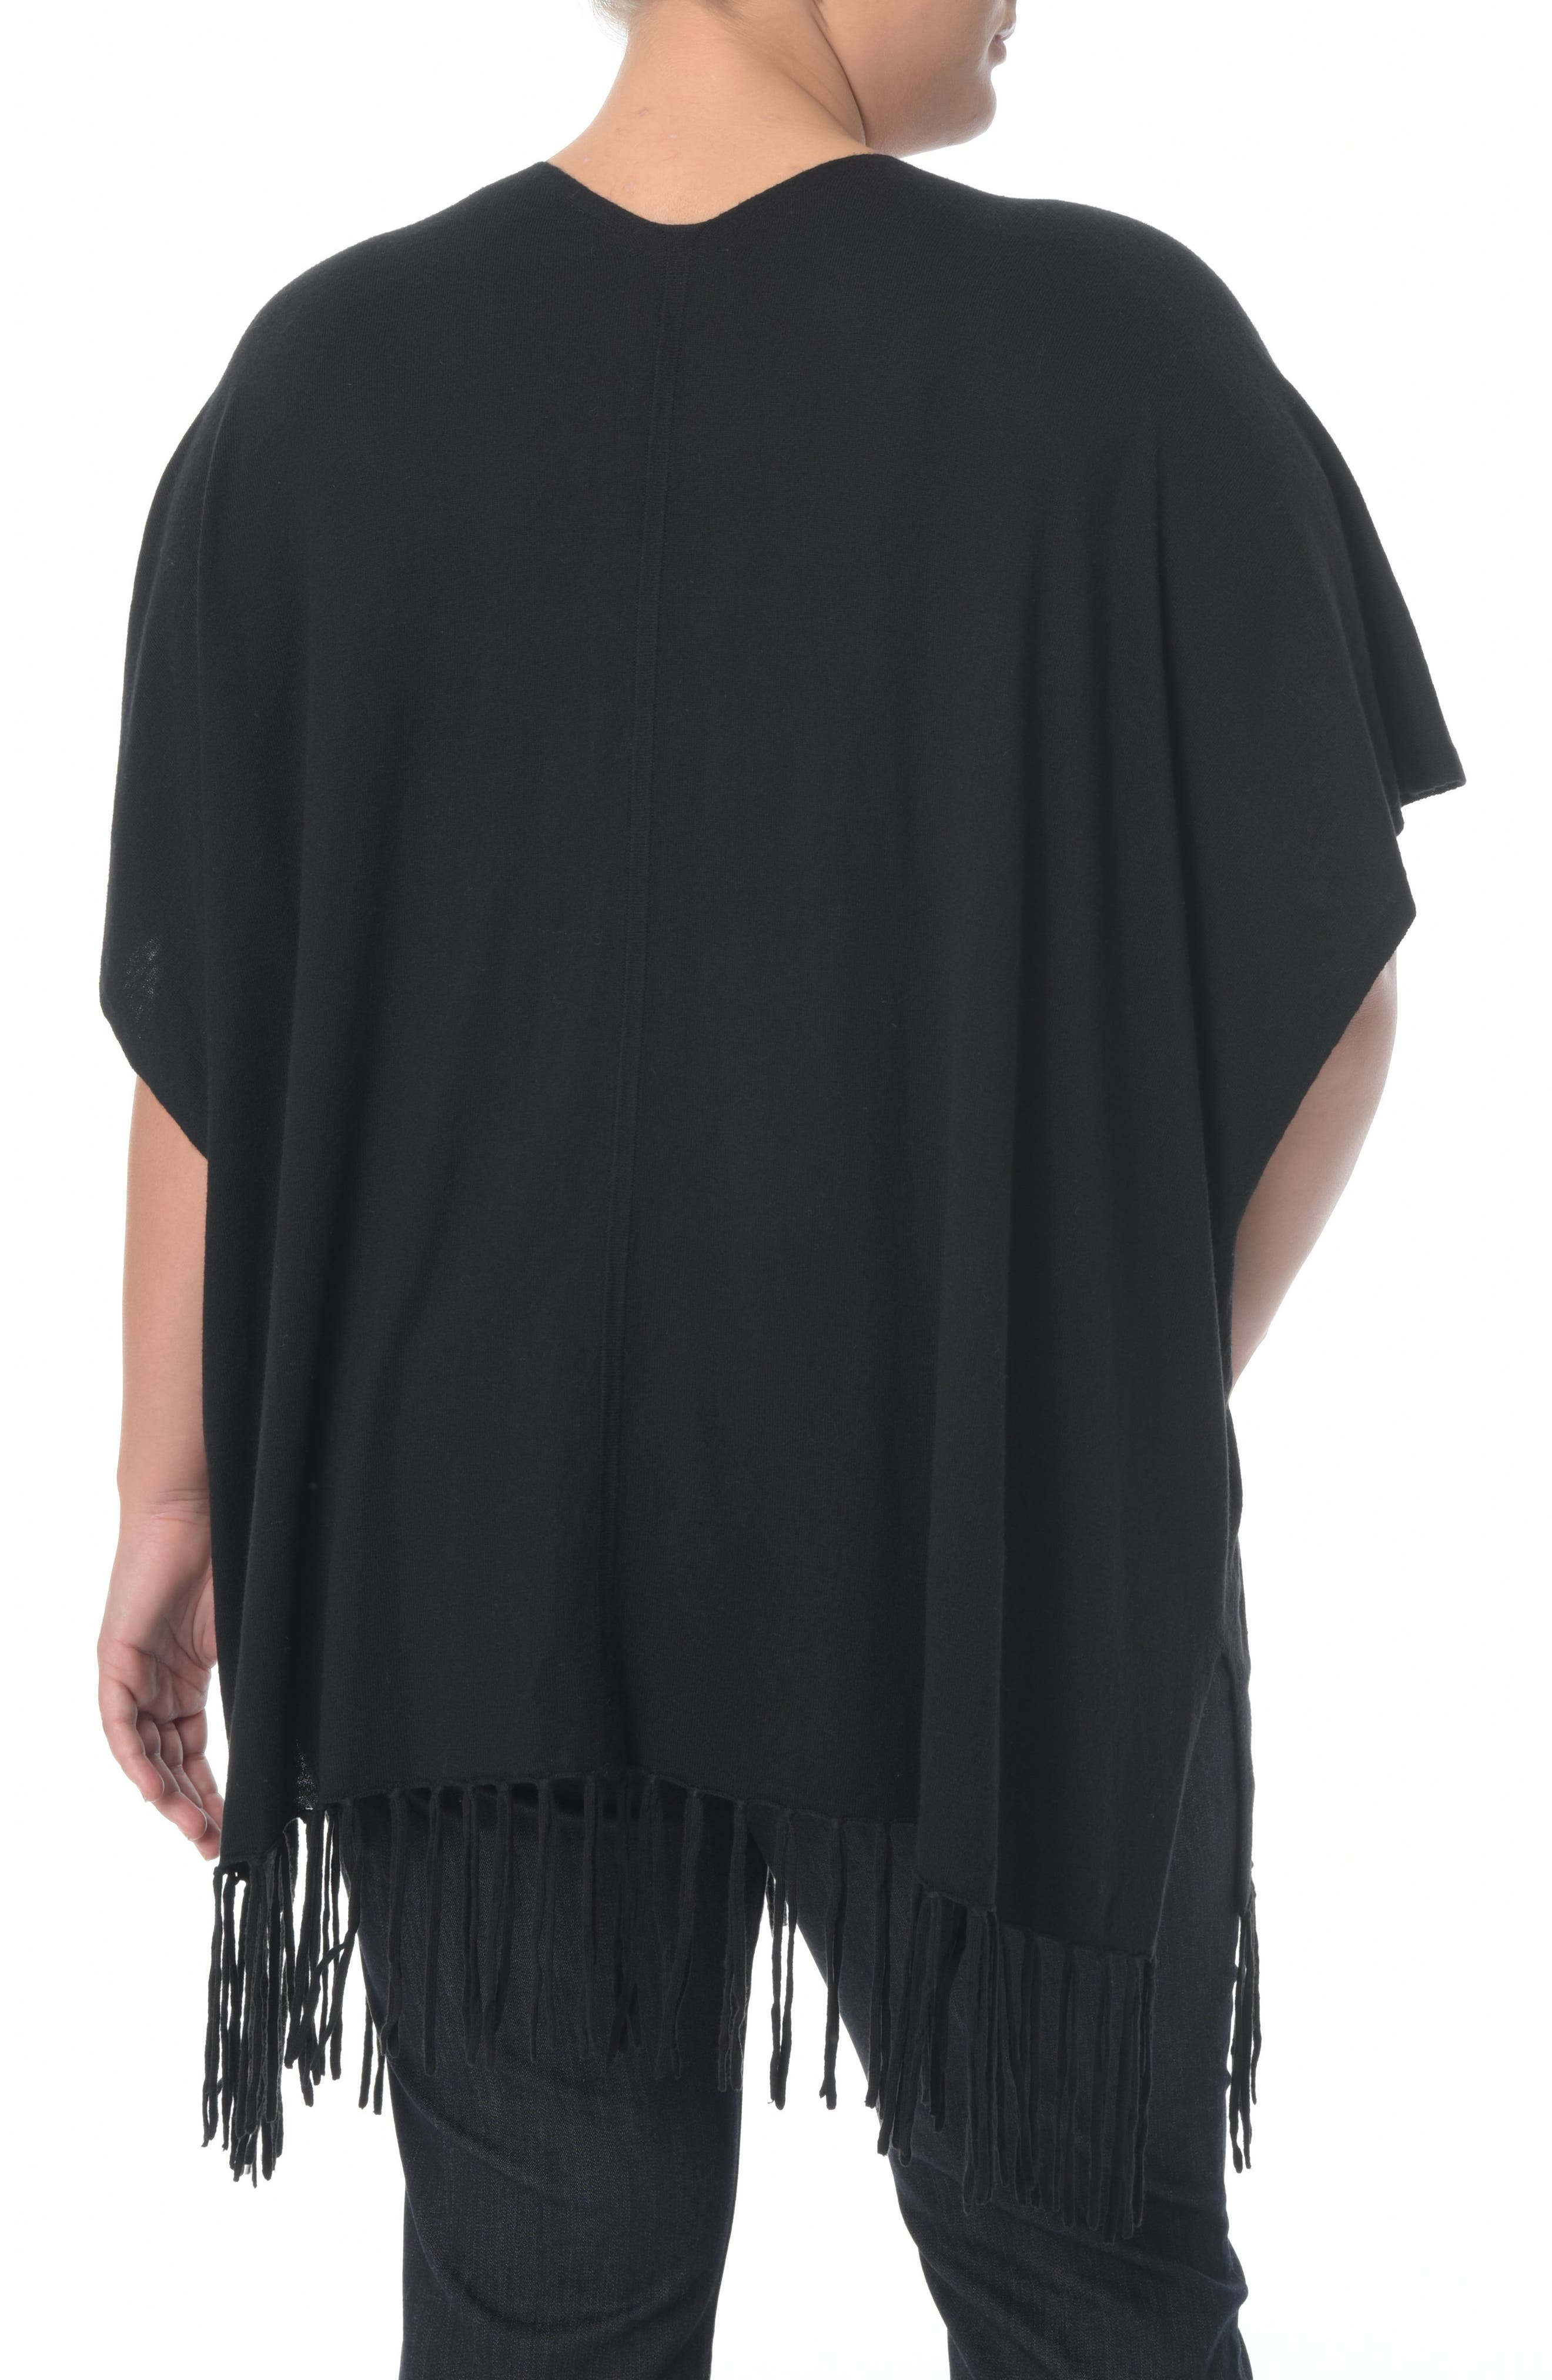 Fringe Sweater Wrap,                             Alternate thumbnail 2, color,                             Black